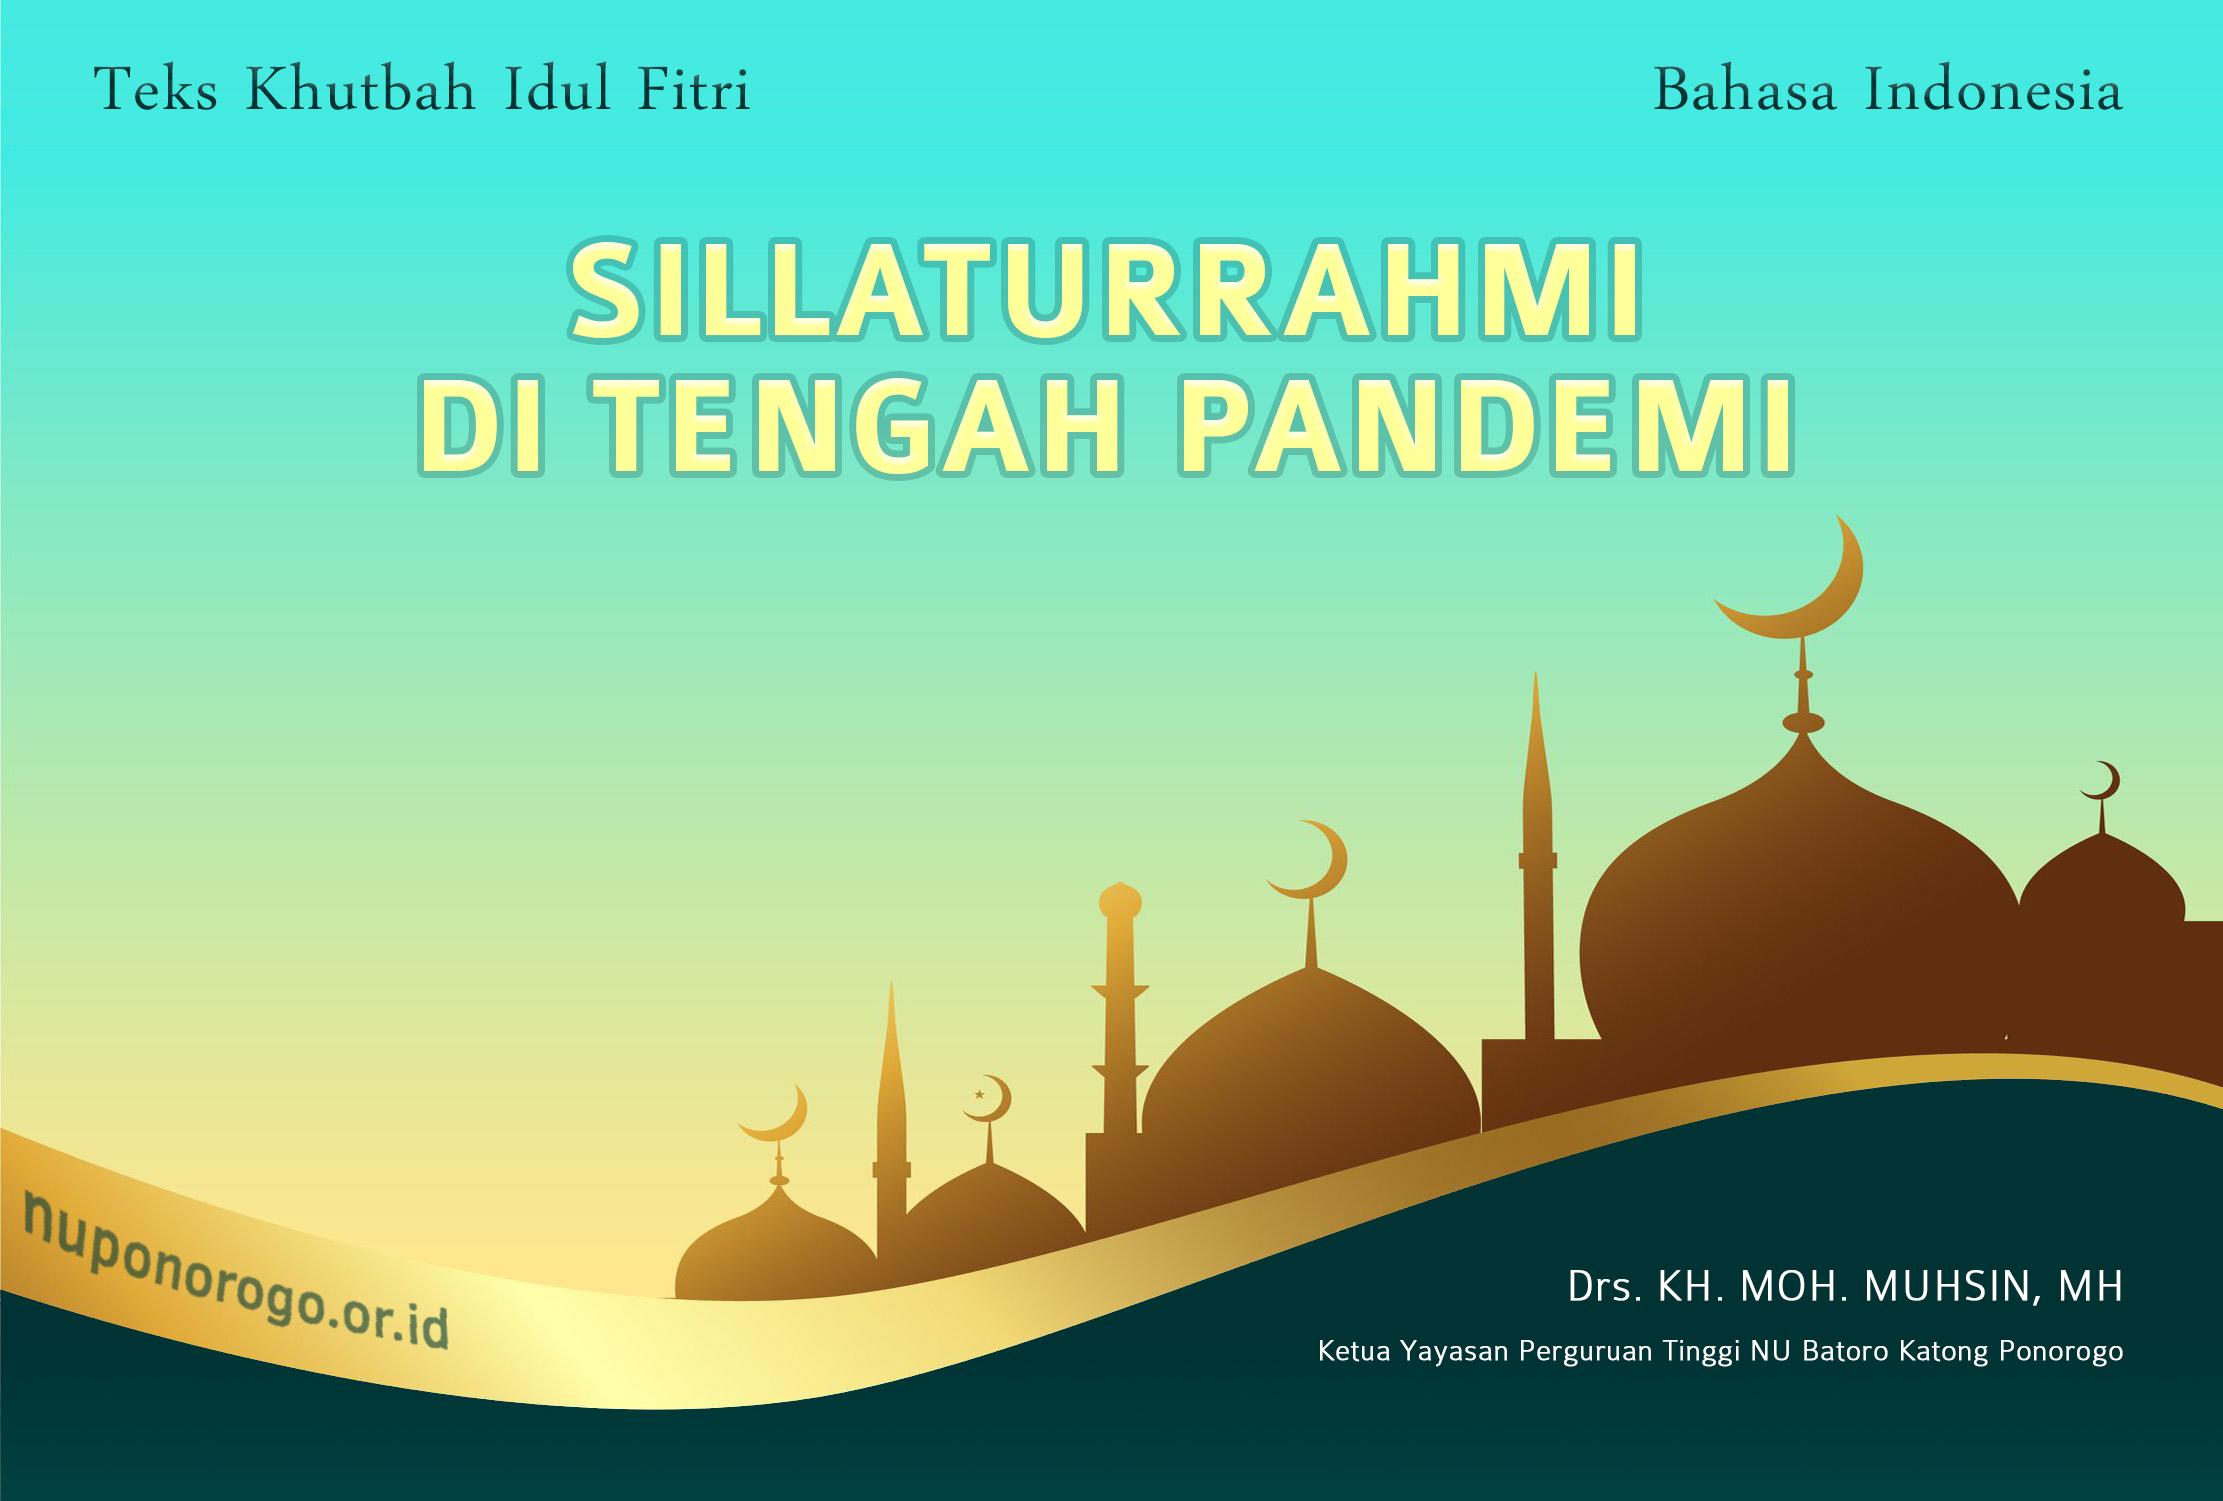 KHUTBAH IDUL FITRI BAHASA INDONESIA 2021 - SILLATURRAHMI DI TENGAH PANDEMI